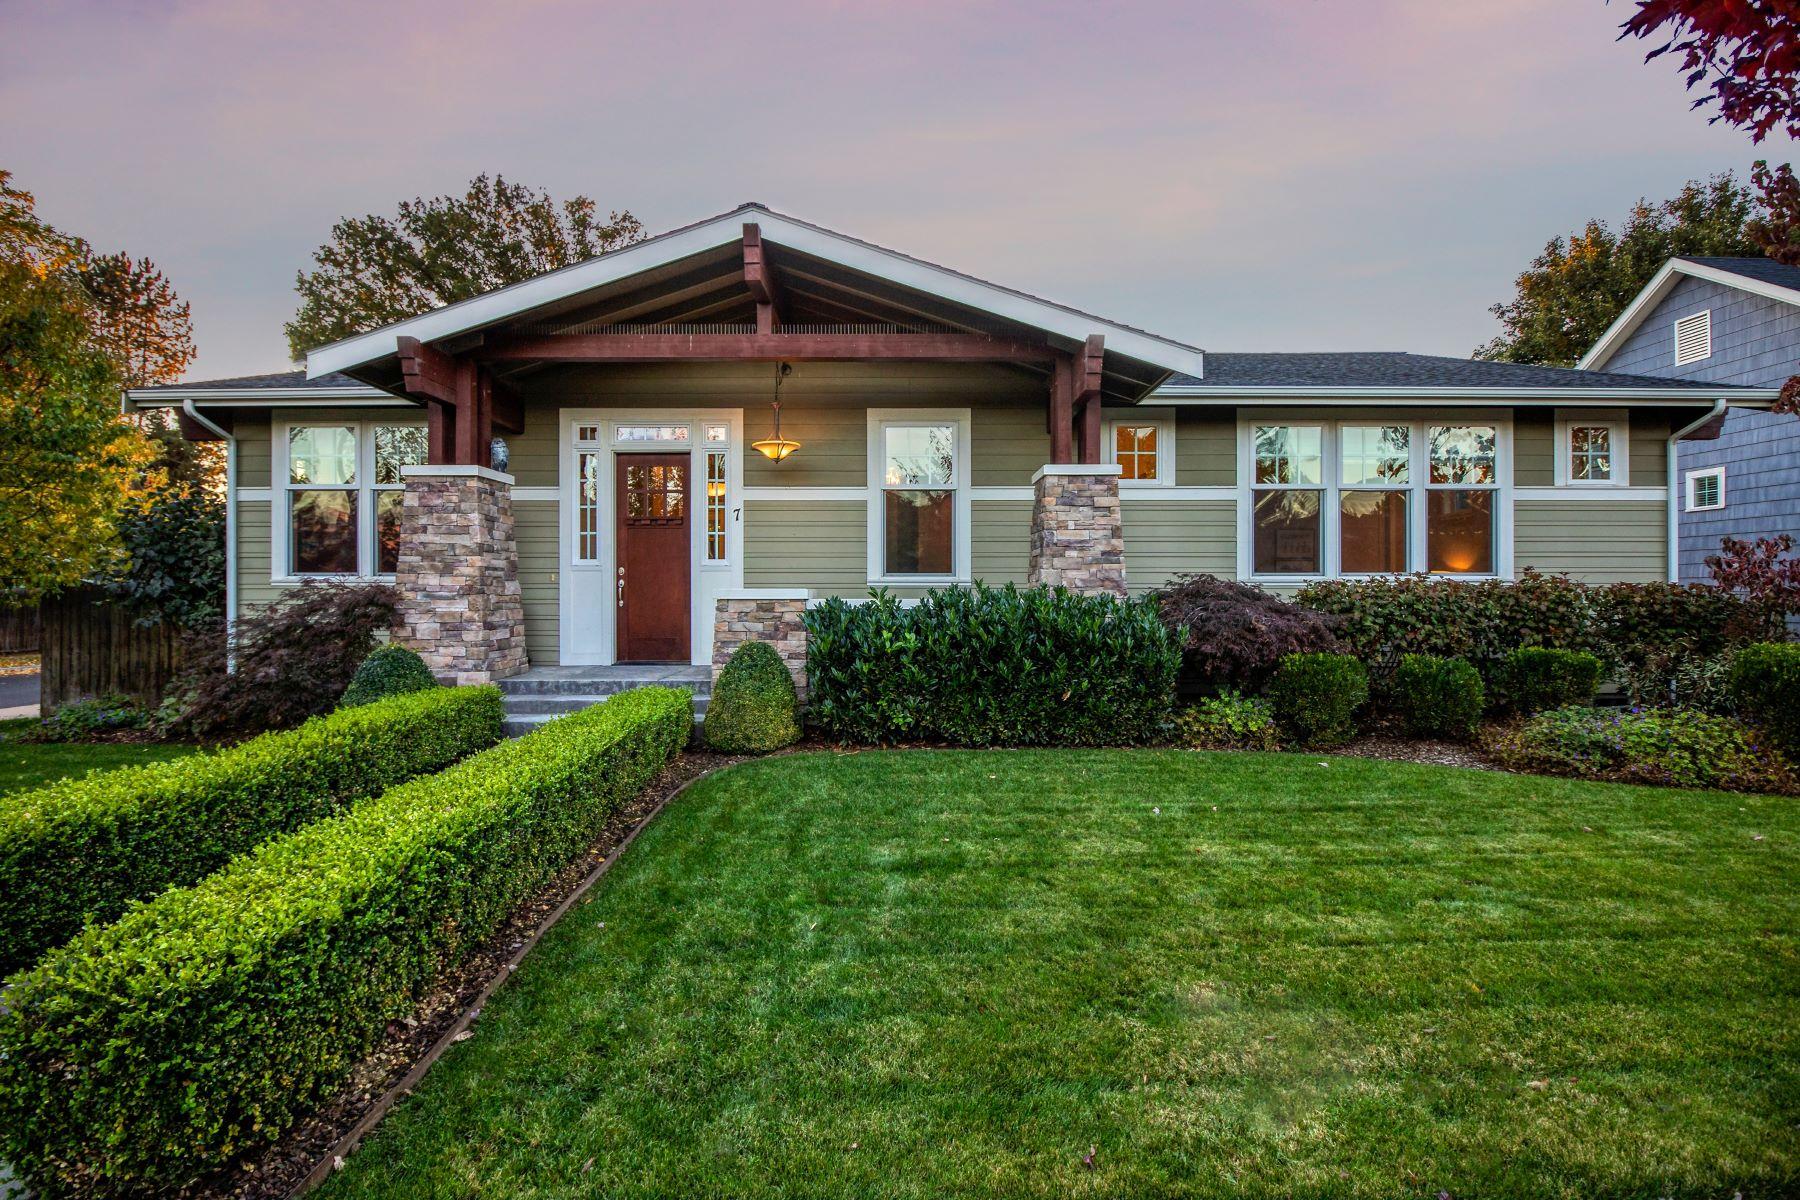 Single Family Homes for Sale at 7 Kensington Drive Walla Walla, Washington 99362 United States